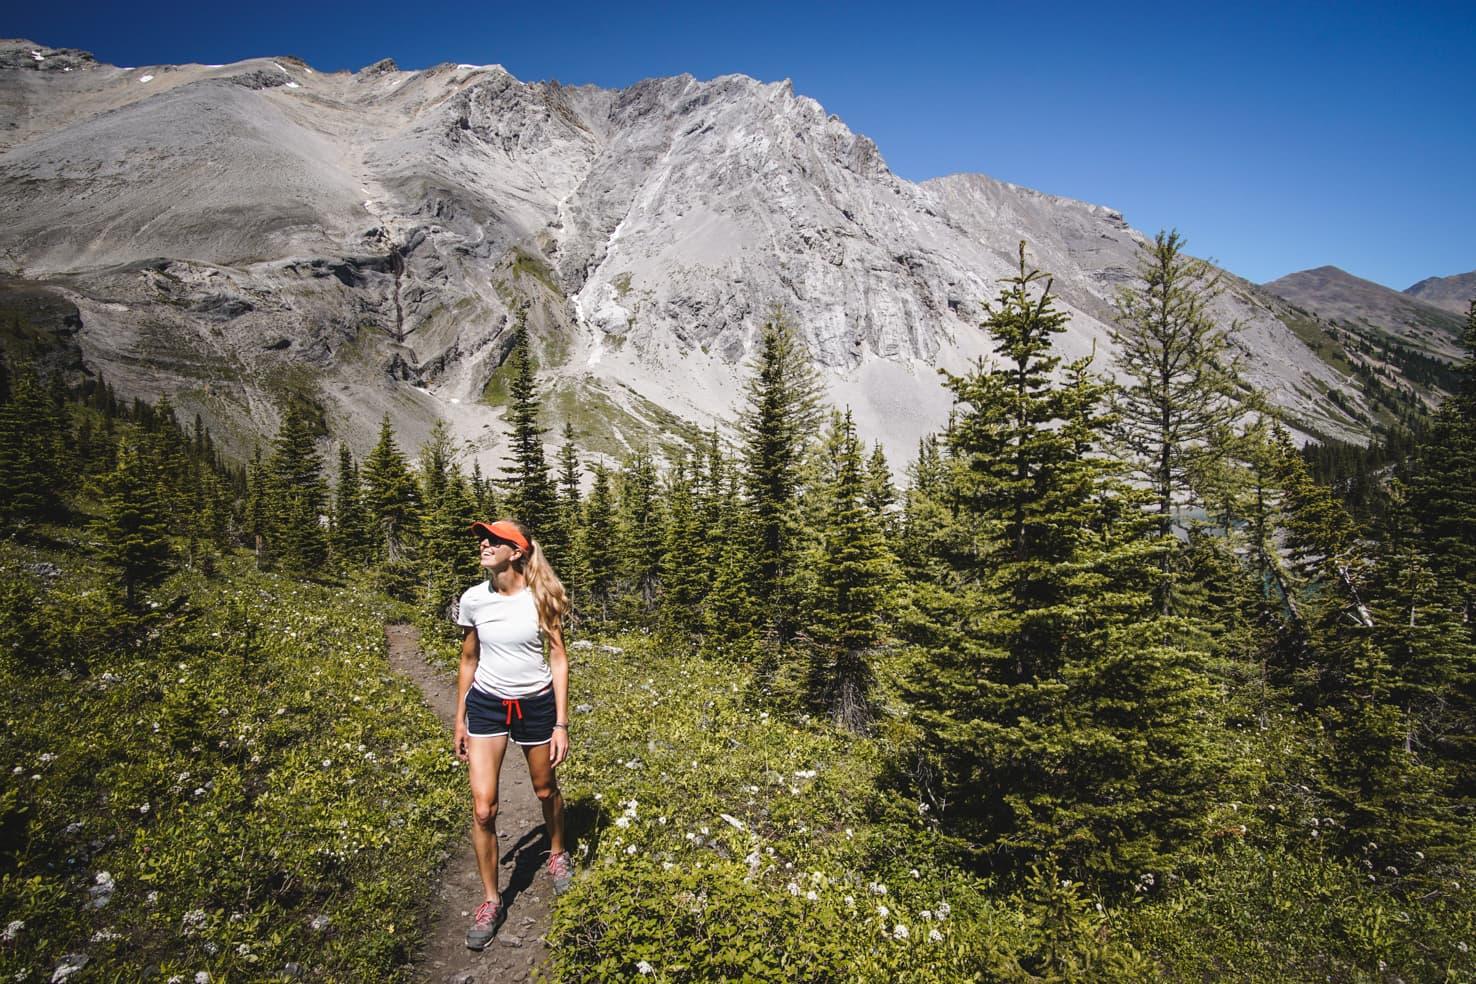 Banff Packing List - Galatea Lakes Hike in Kananaskis